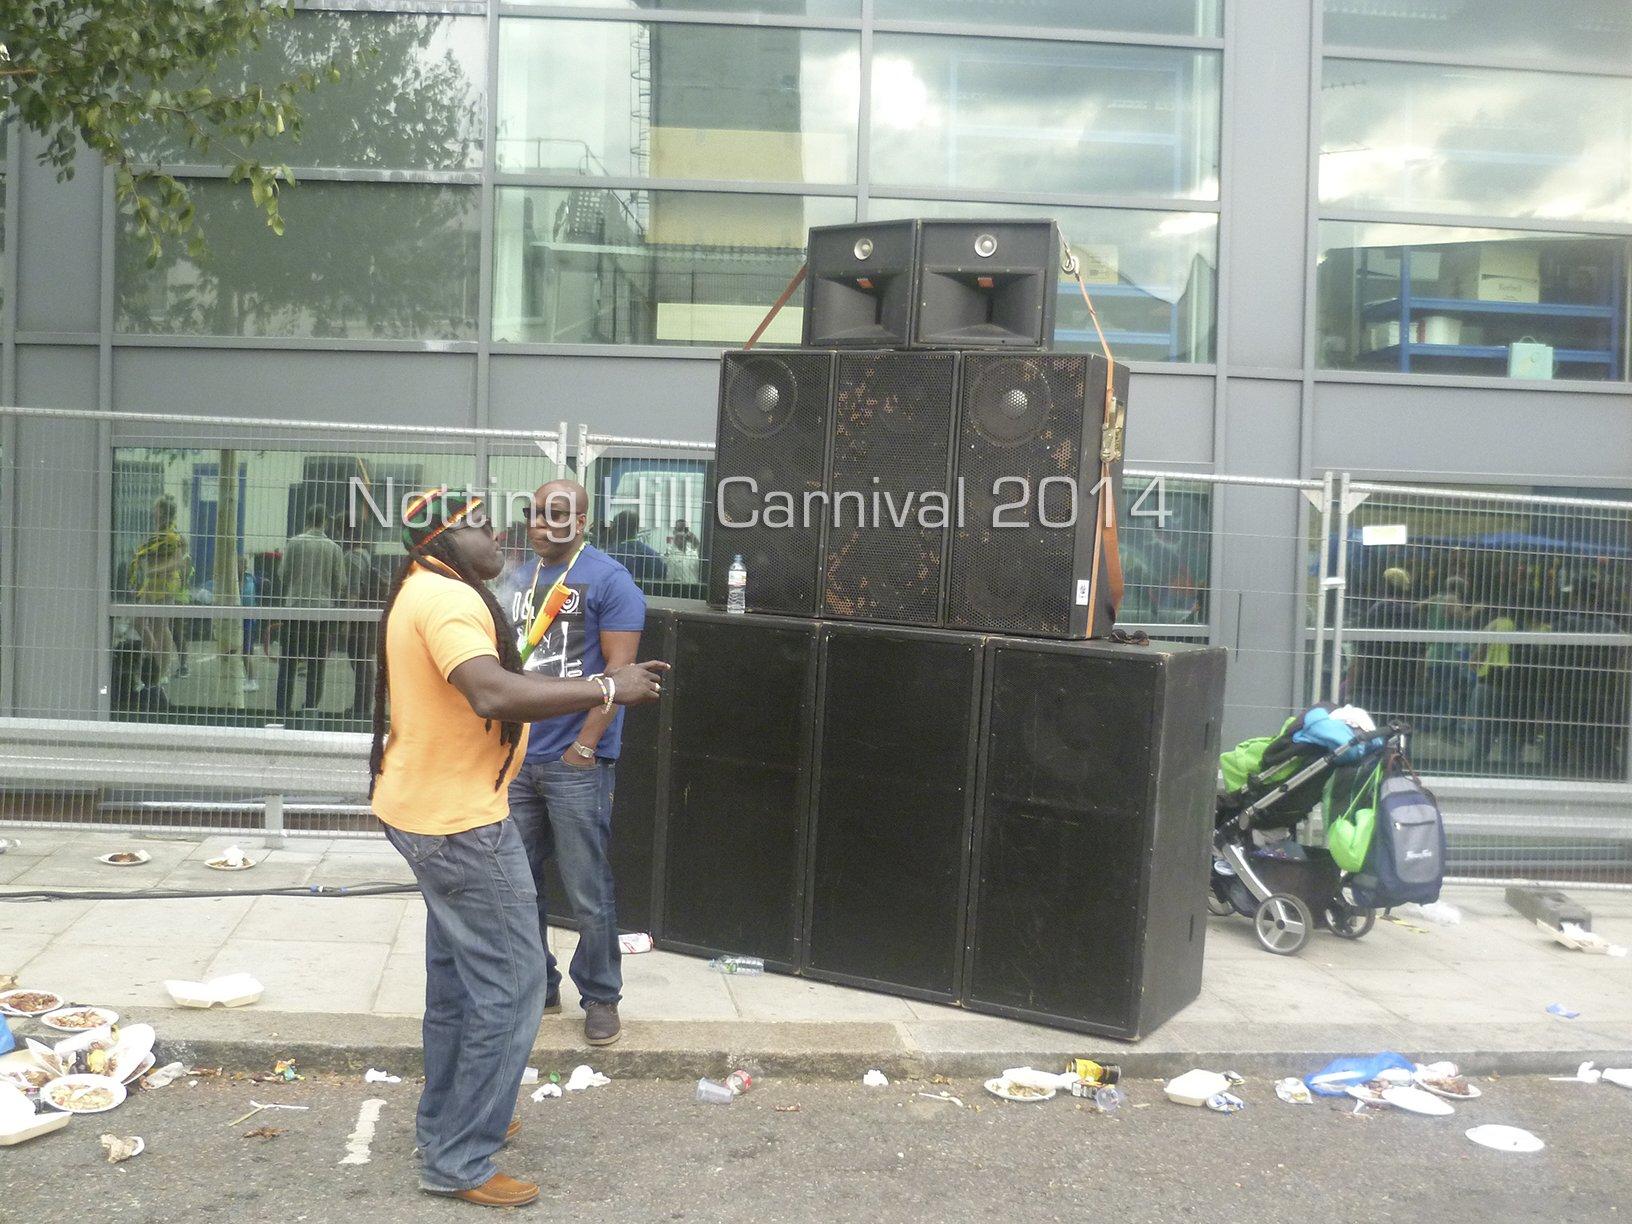 Notting-Hill-Carnival-2014-Street-Sound-System-24